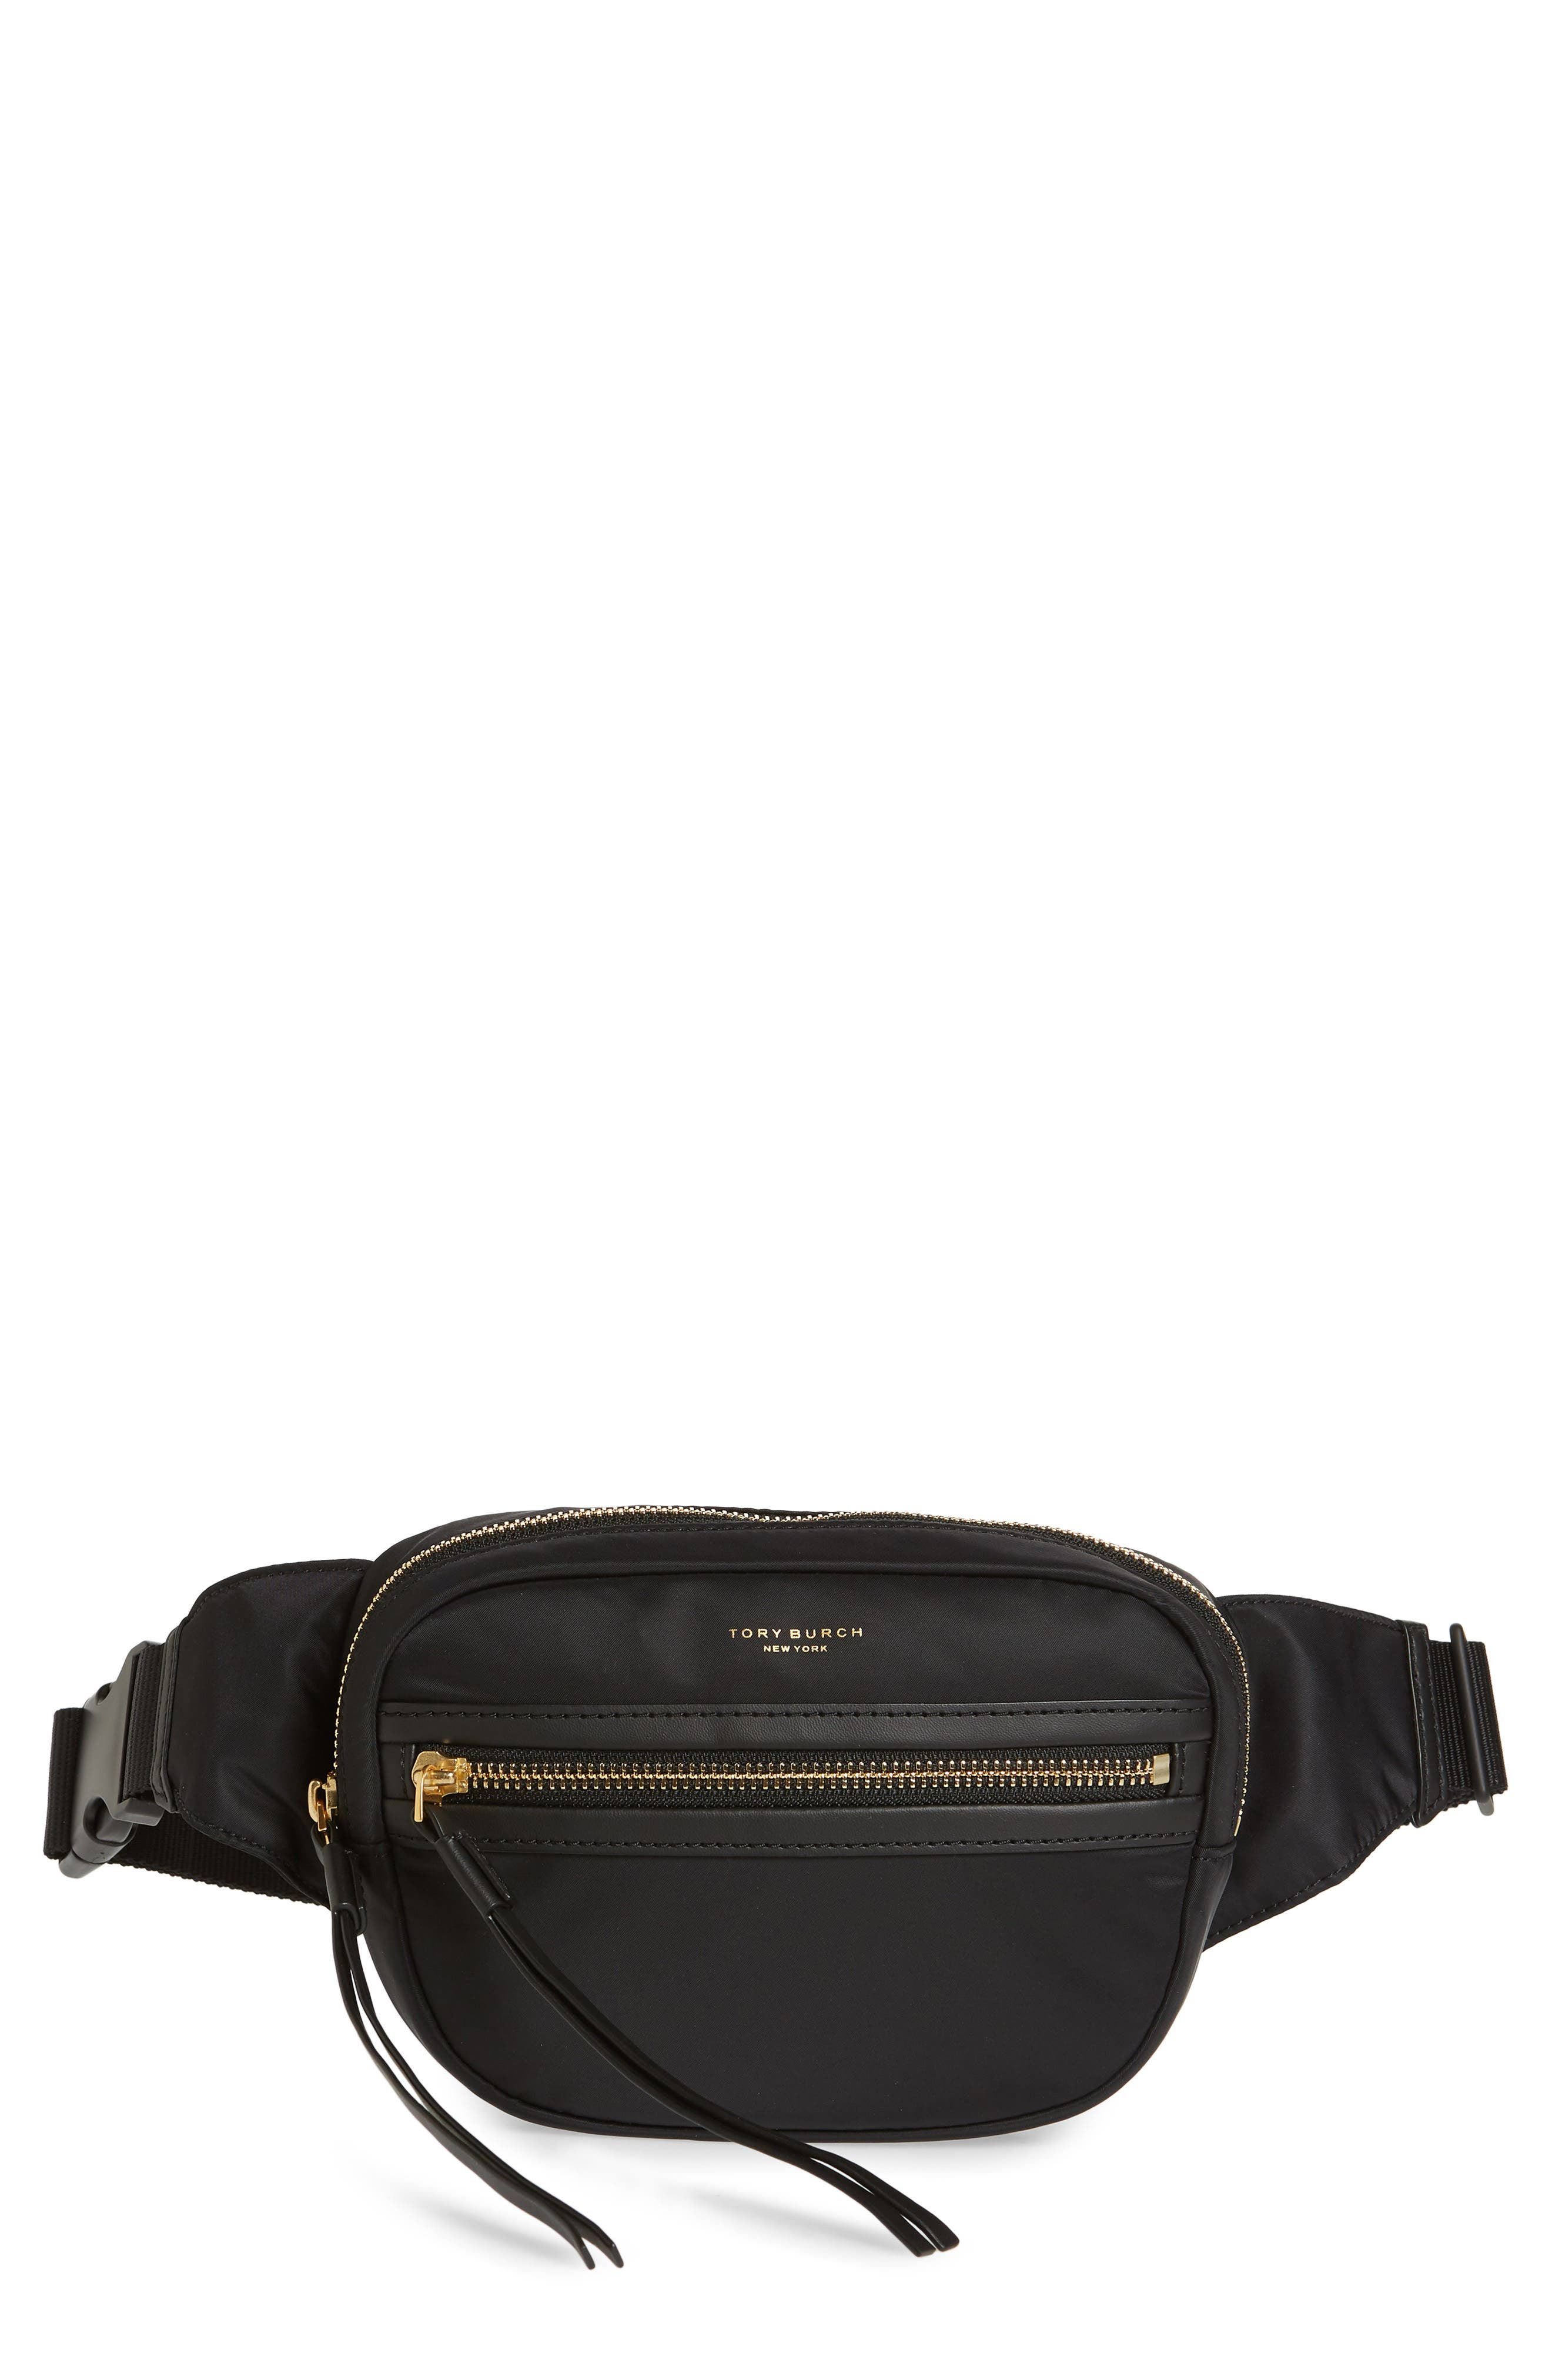 a82e04773e1 Tory Burch Belt Bags & Fanny Packs | Nordstrom